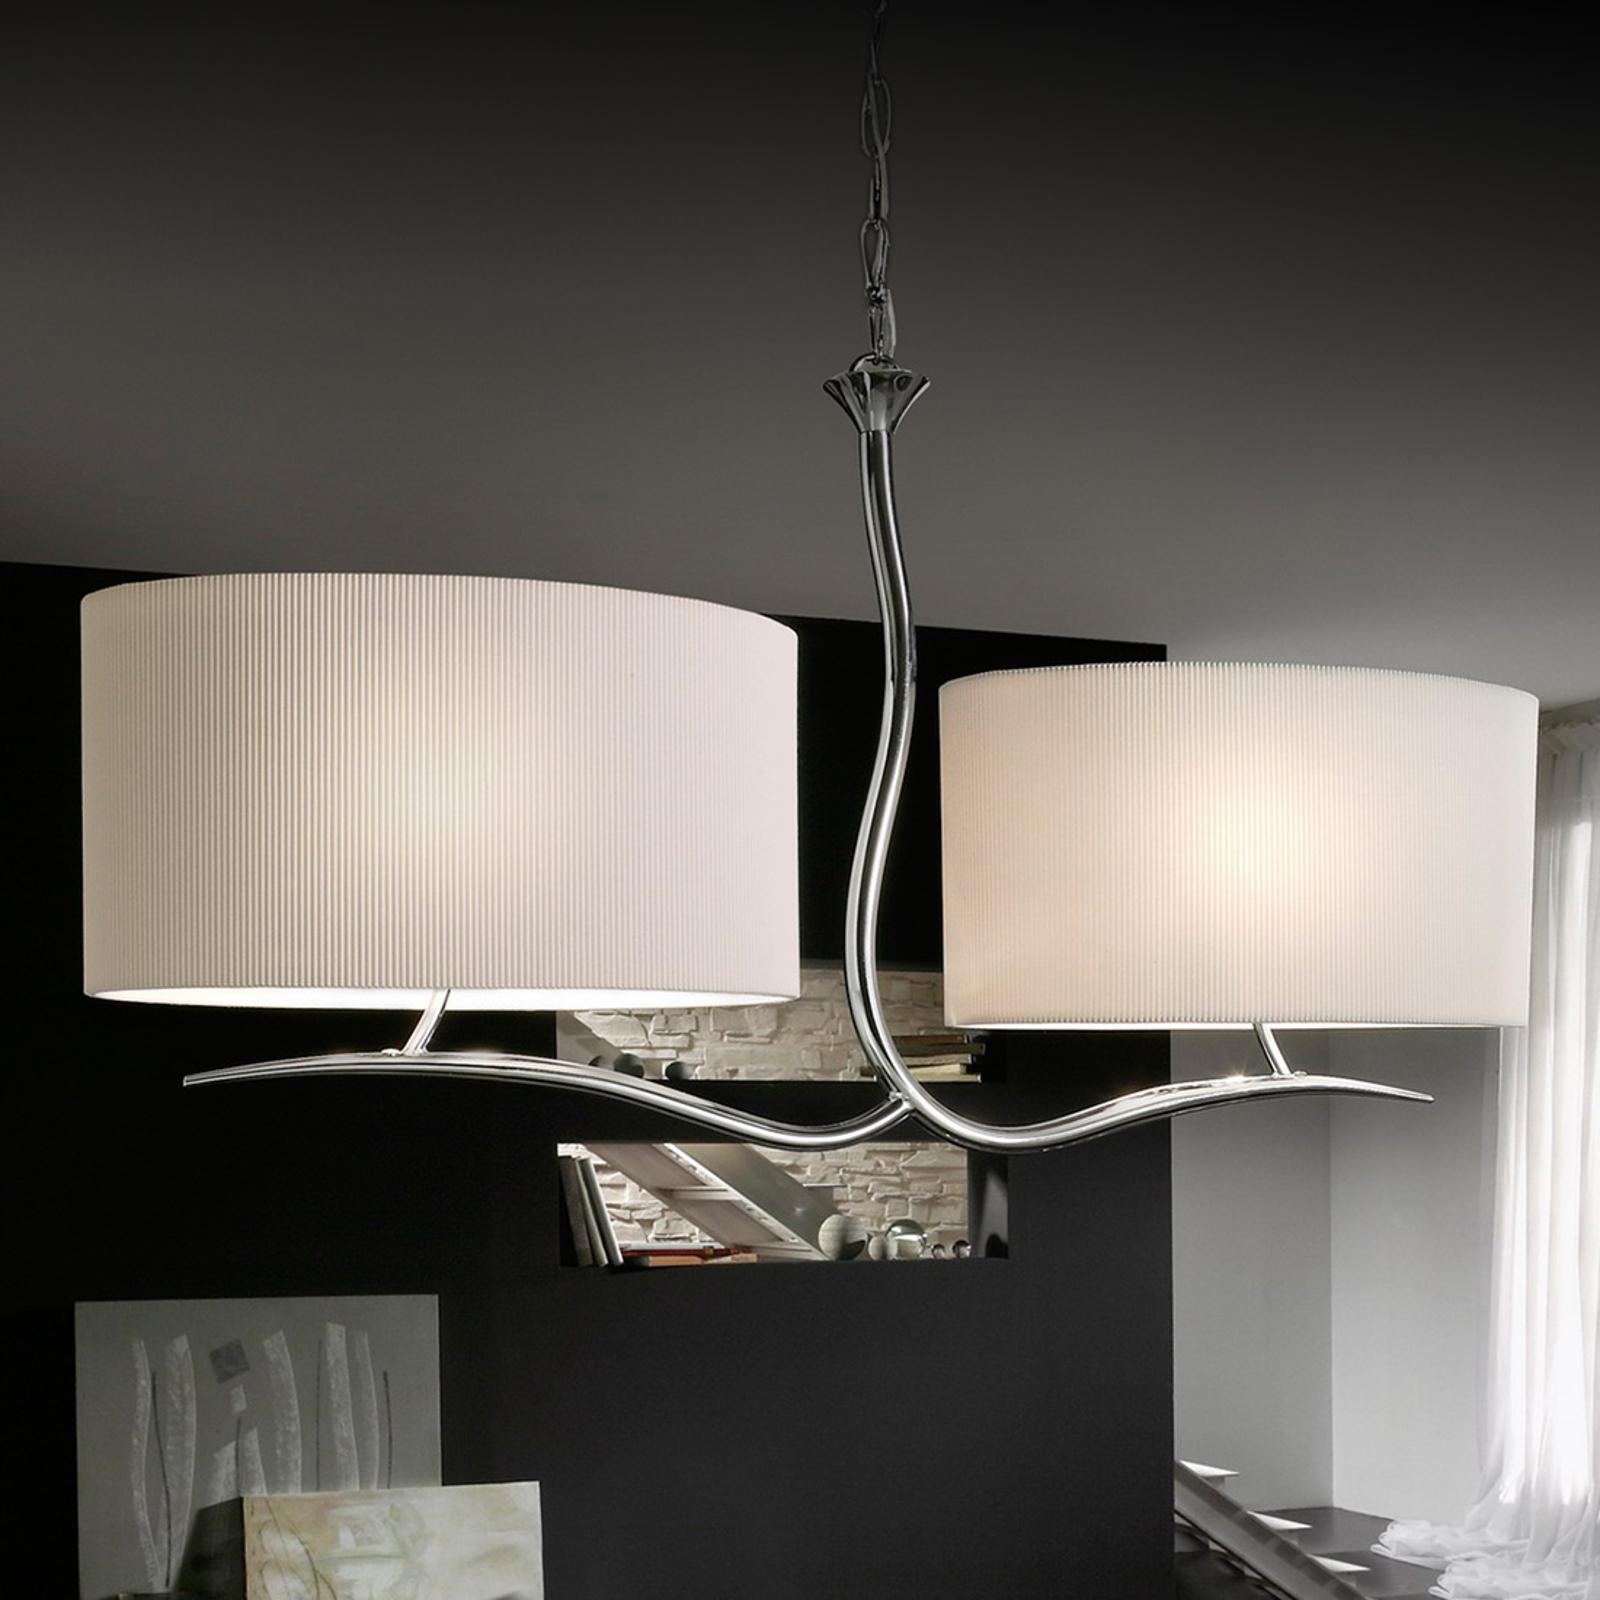 Hanglamp Eve m wit textiel lampenkap m 2 lampjes